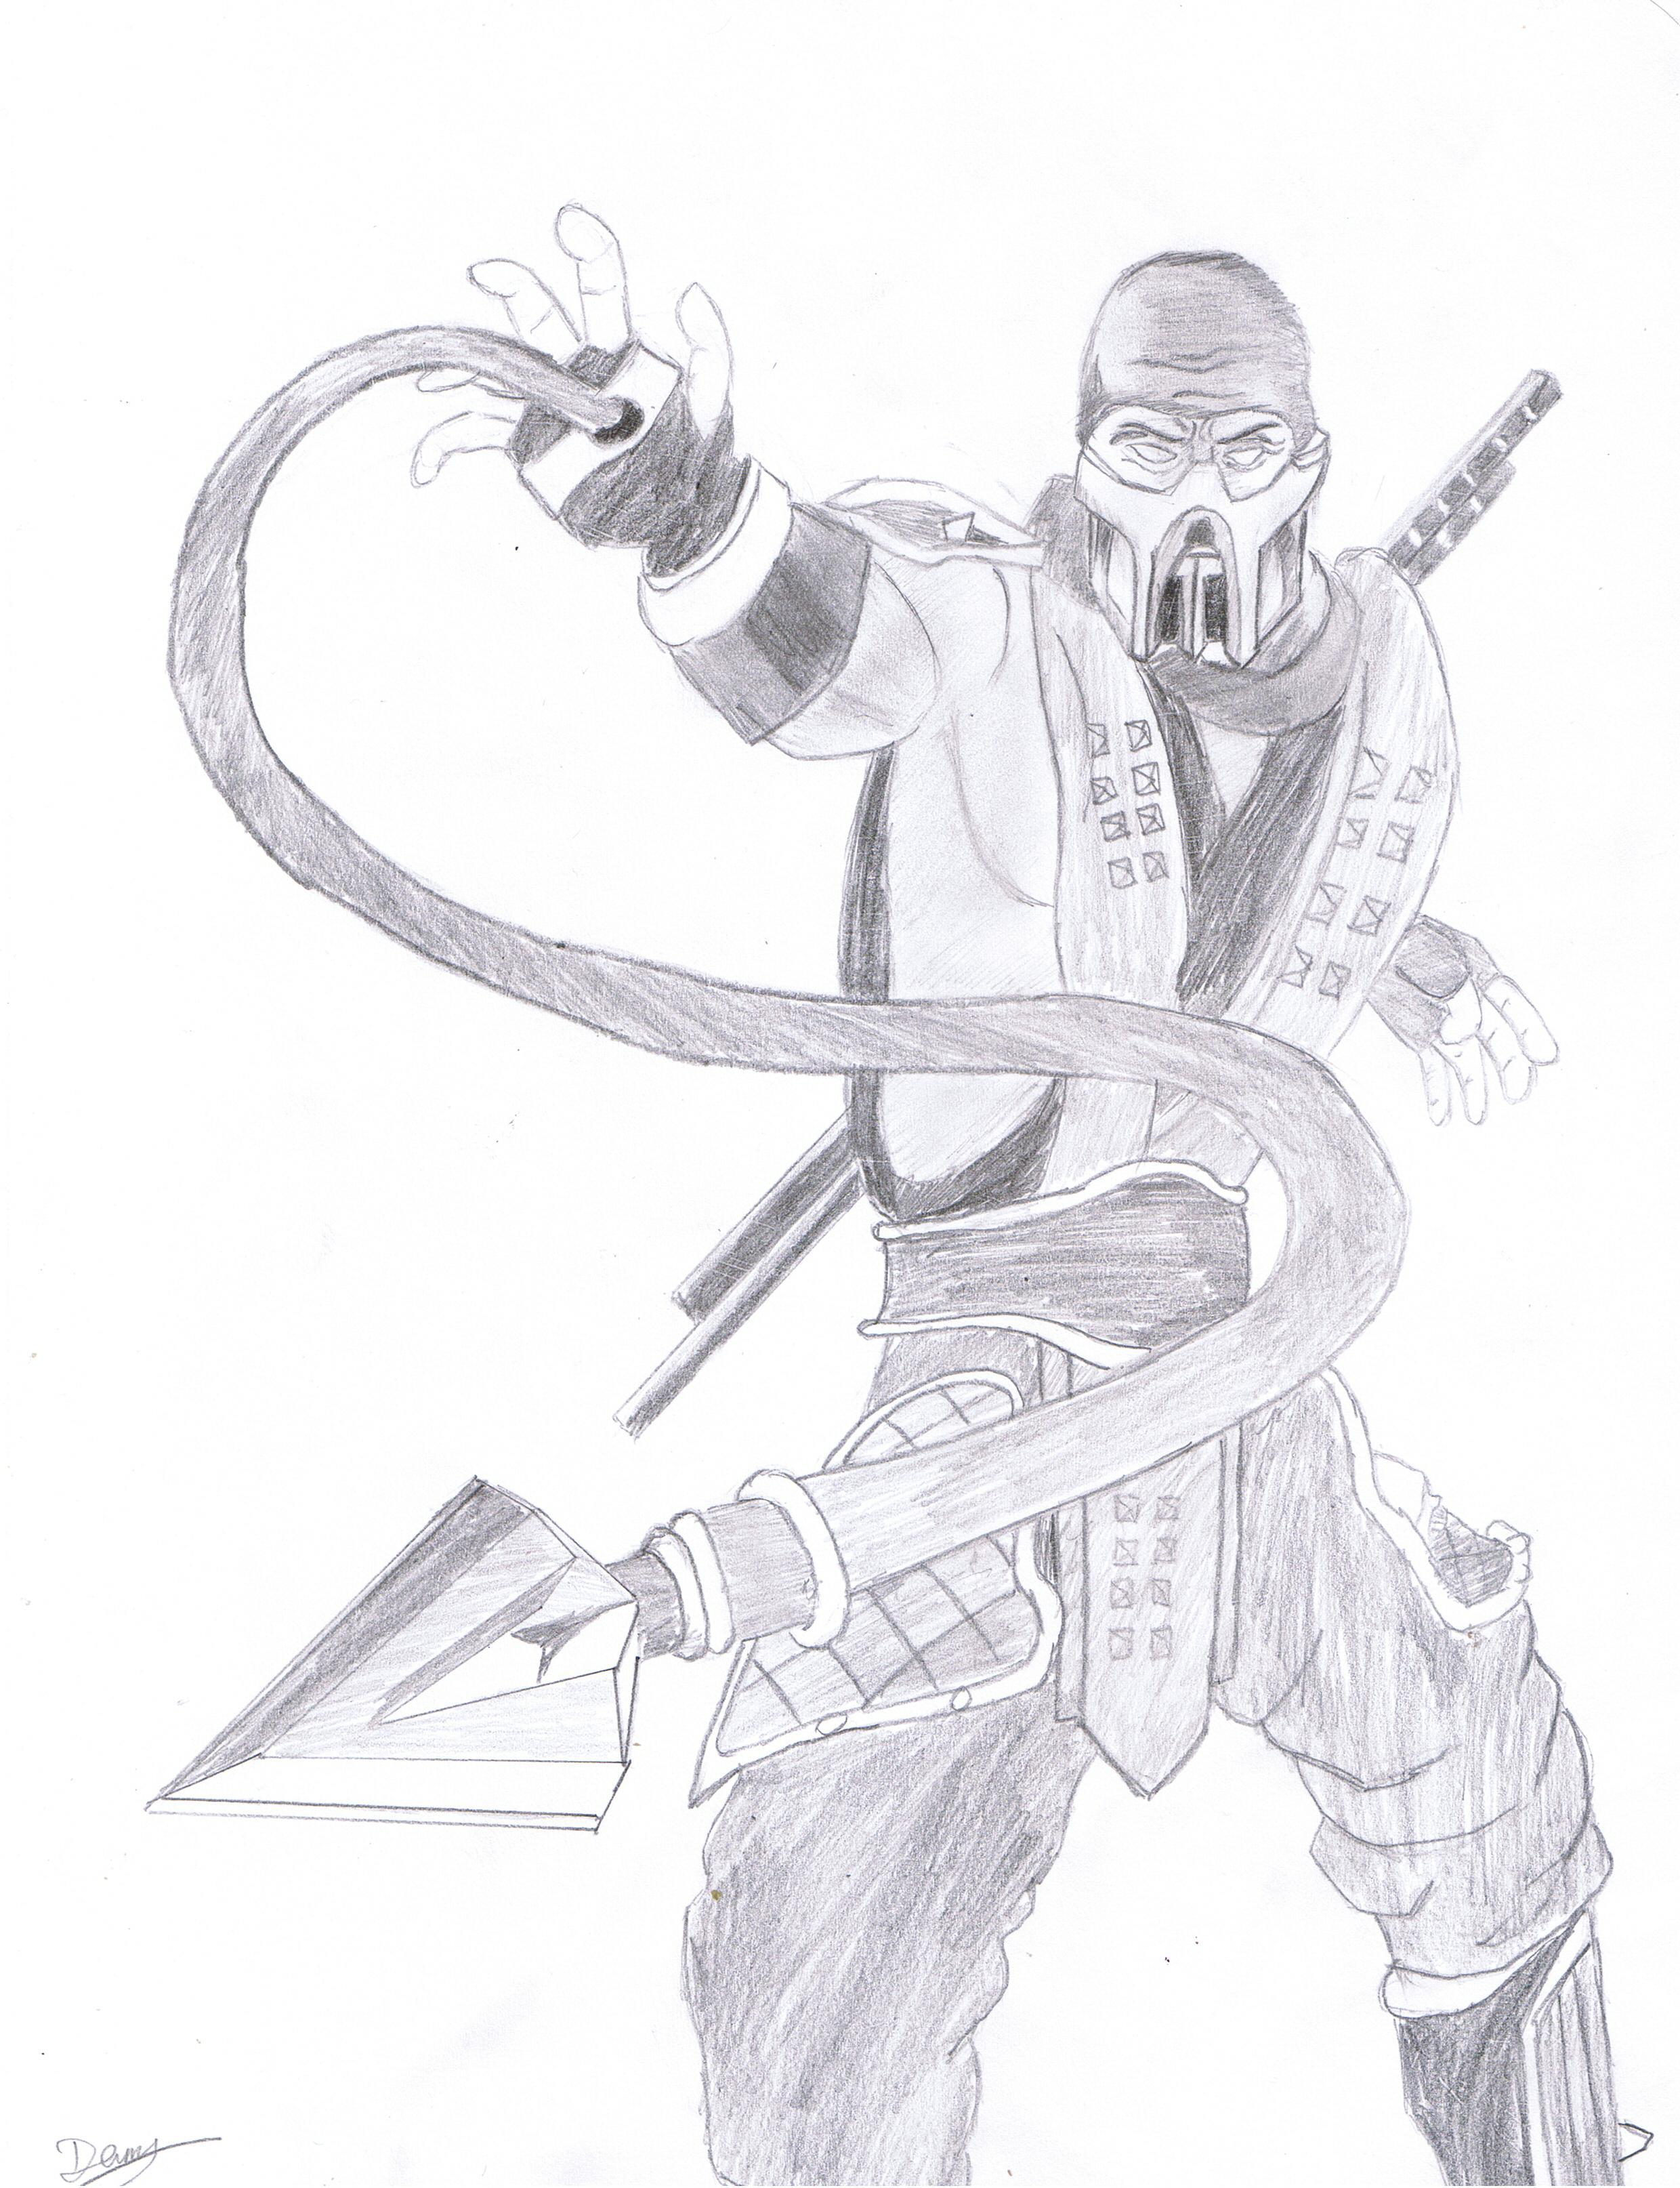 mortal kombat drawing at getdrawings free for personal use Mortal Kombat Barbie 1041x581 mortal kombat scorpion 2480x3229 scorpion